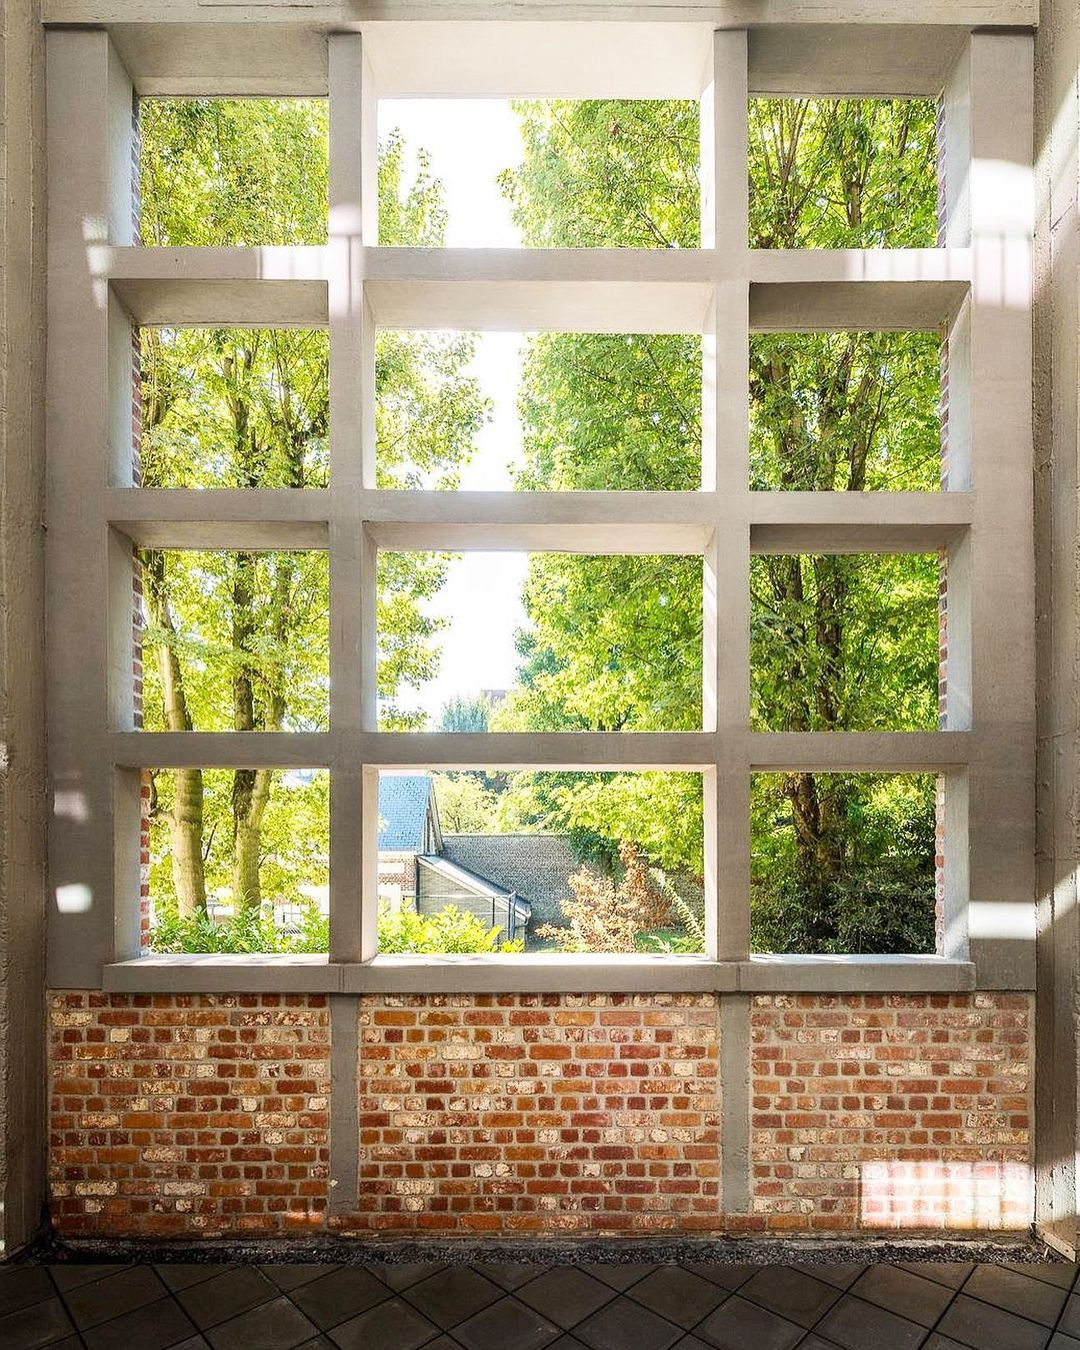 2019 07 09 Bzss1eqIMMD 2084237916663497475 | Baeyens & Beck architecten Gent | architect nieuwbouw renovatie interieur | high end | architectenbureau